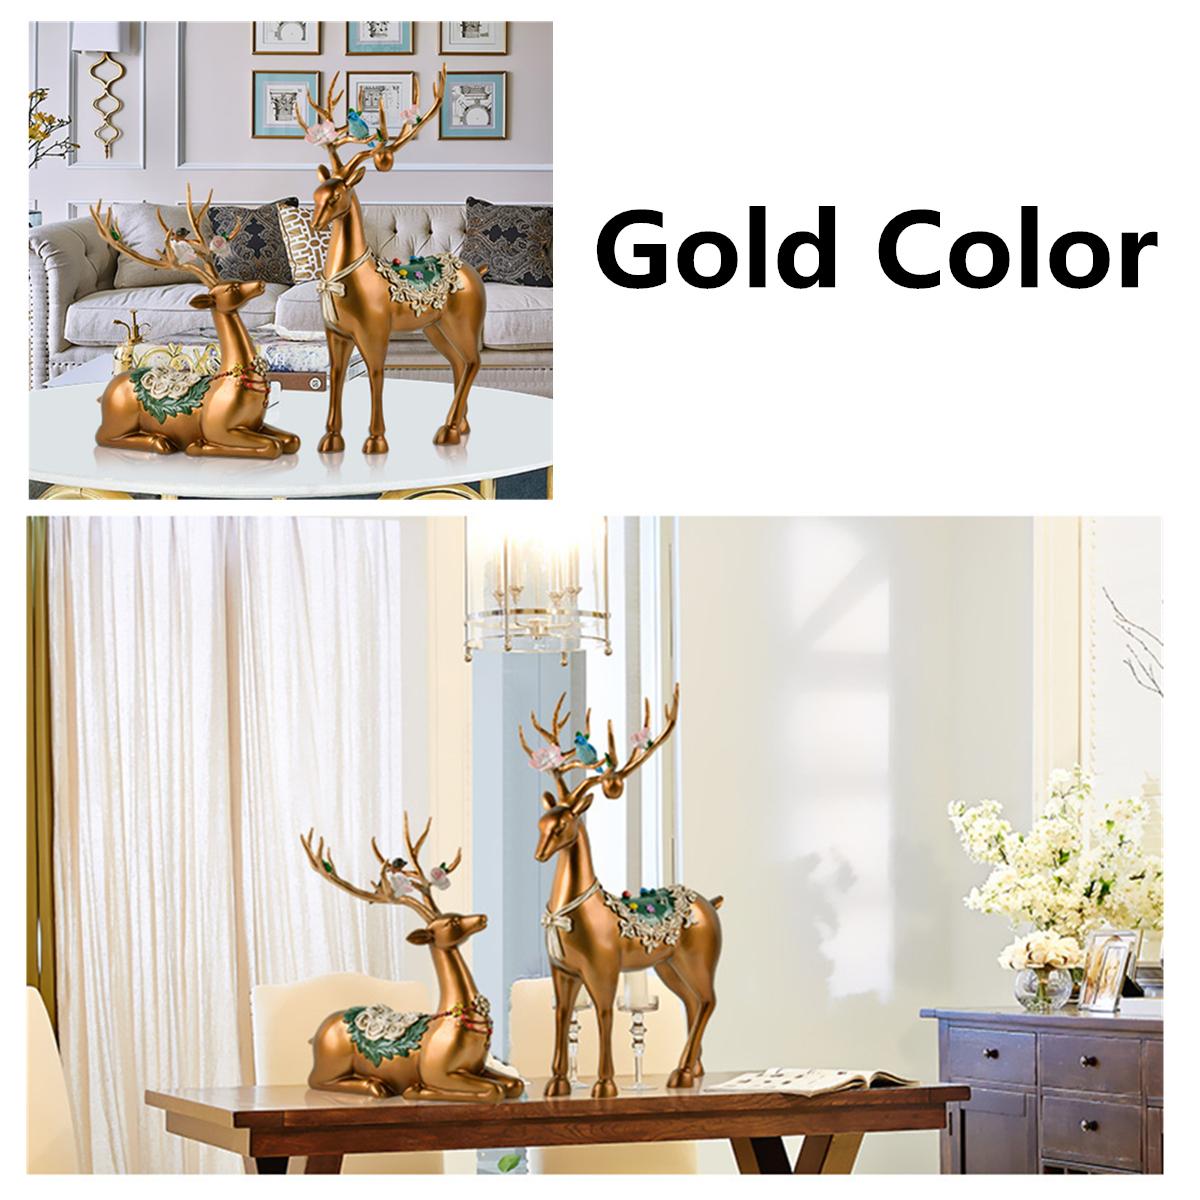 Desktop Resin Deer Figurine Decorations Ornament Living Room Bedroom Home Decor Gifts